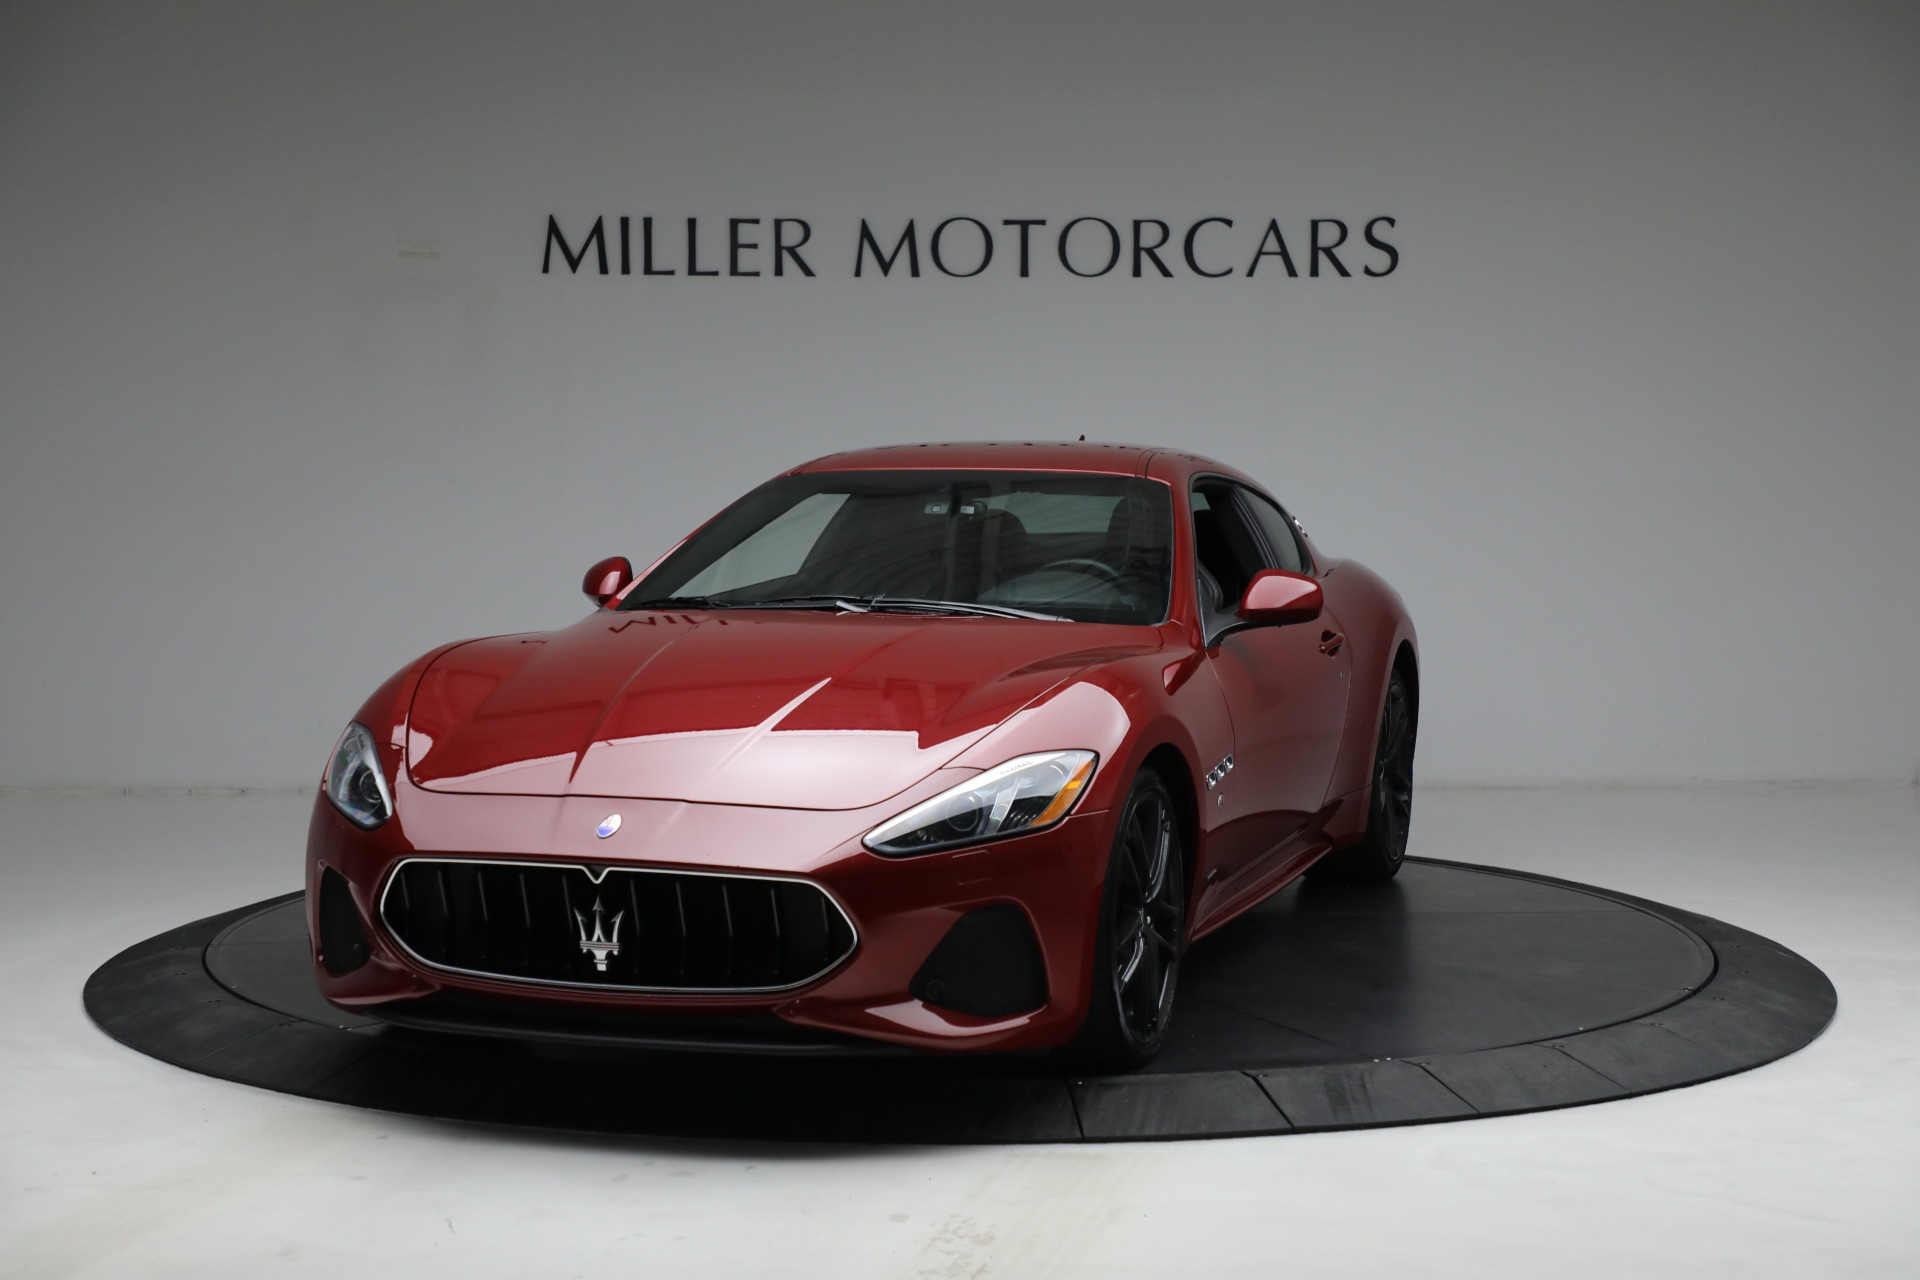 Used 2018 Maserati GranTurismo Sport for sale $94,900 at Rolls-Royce Motor Cars Greenwich in Greenwich CT 06830 1